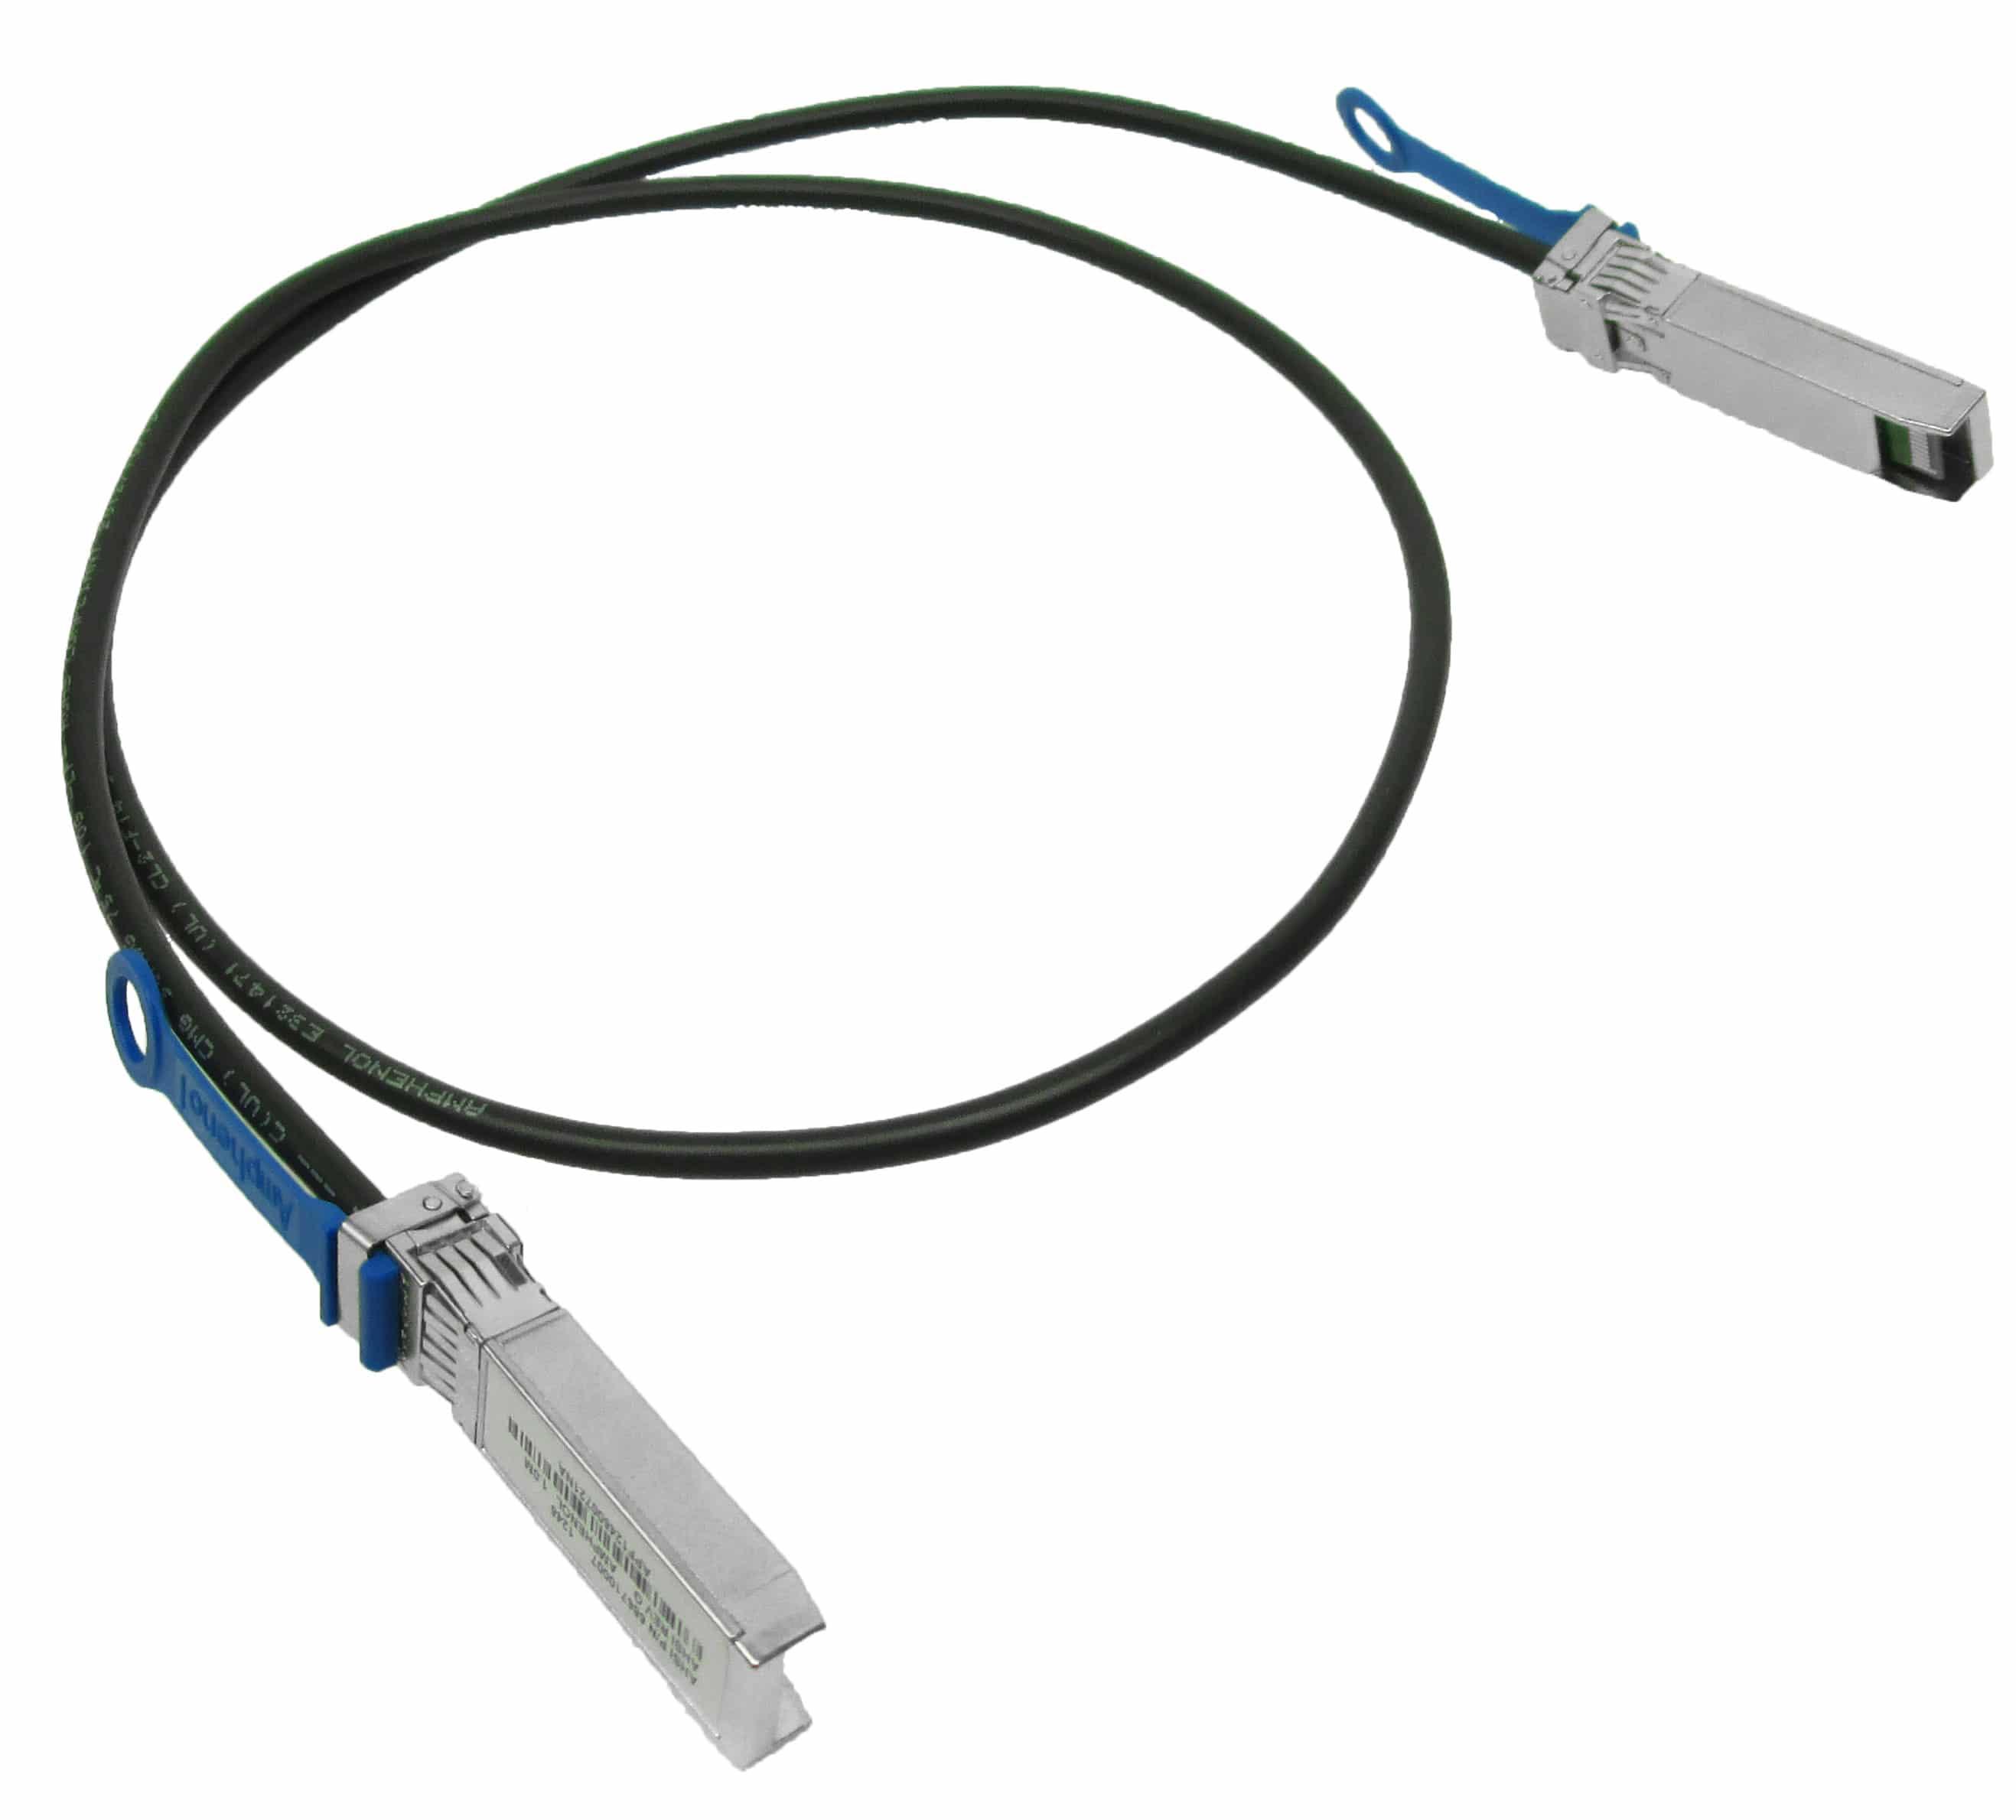 SFP+ DAC 10GBASE-CR 5m, Juniper Networks compatible EX-SFP-10GE-DAC-5M